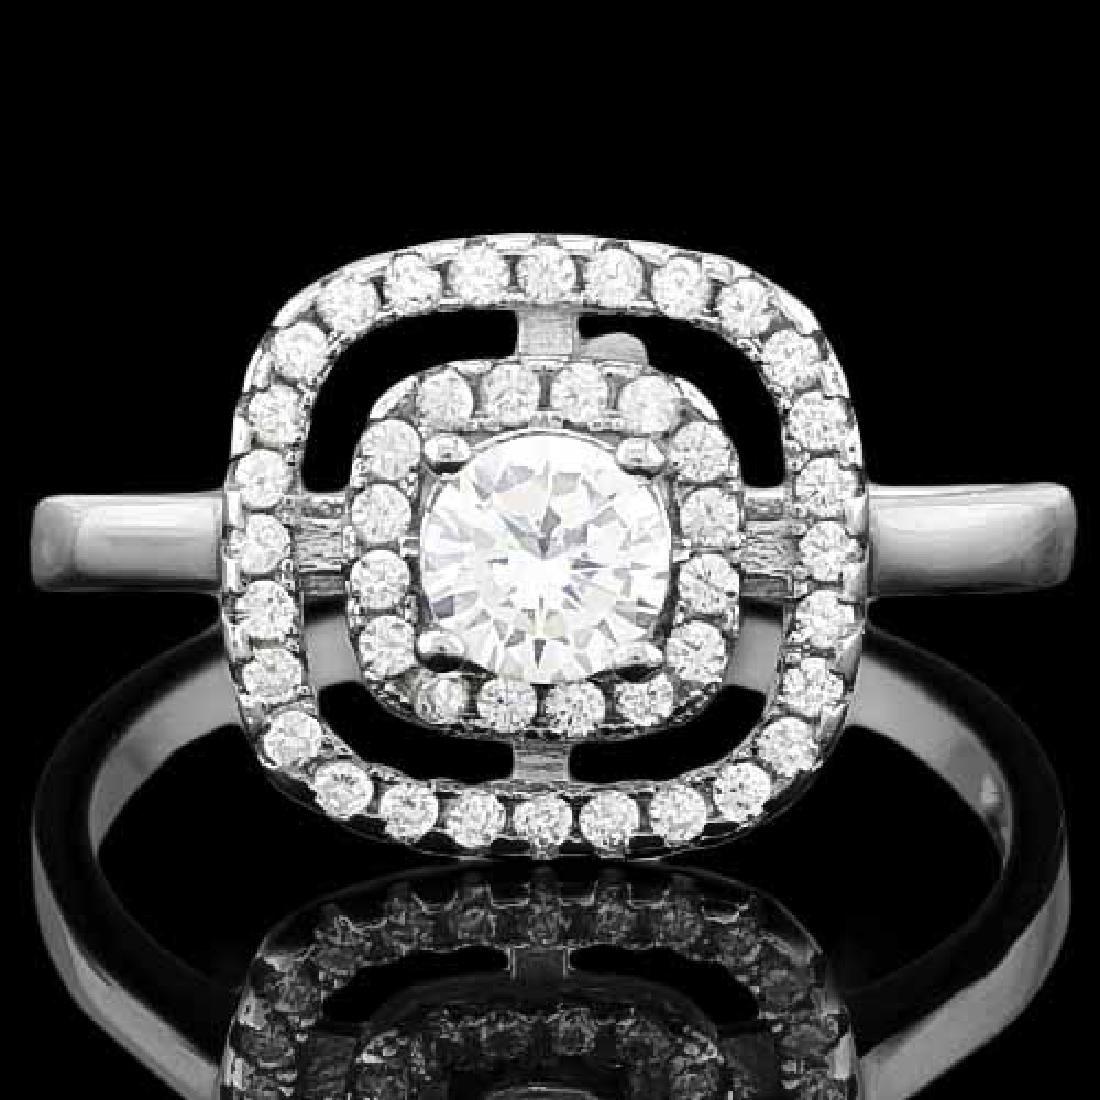 1 CARAT (45 PCS) FLAWLESS CREATED DIAMOND 925 STERLING